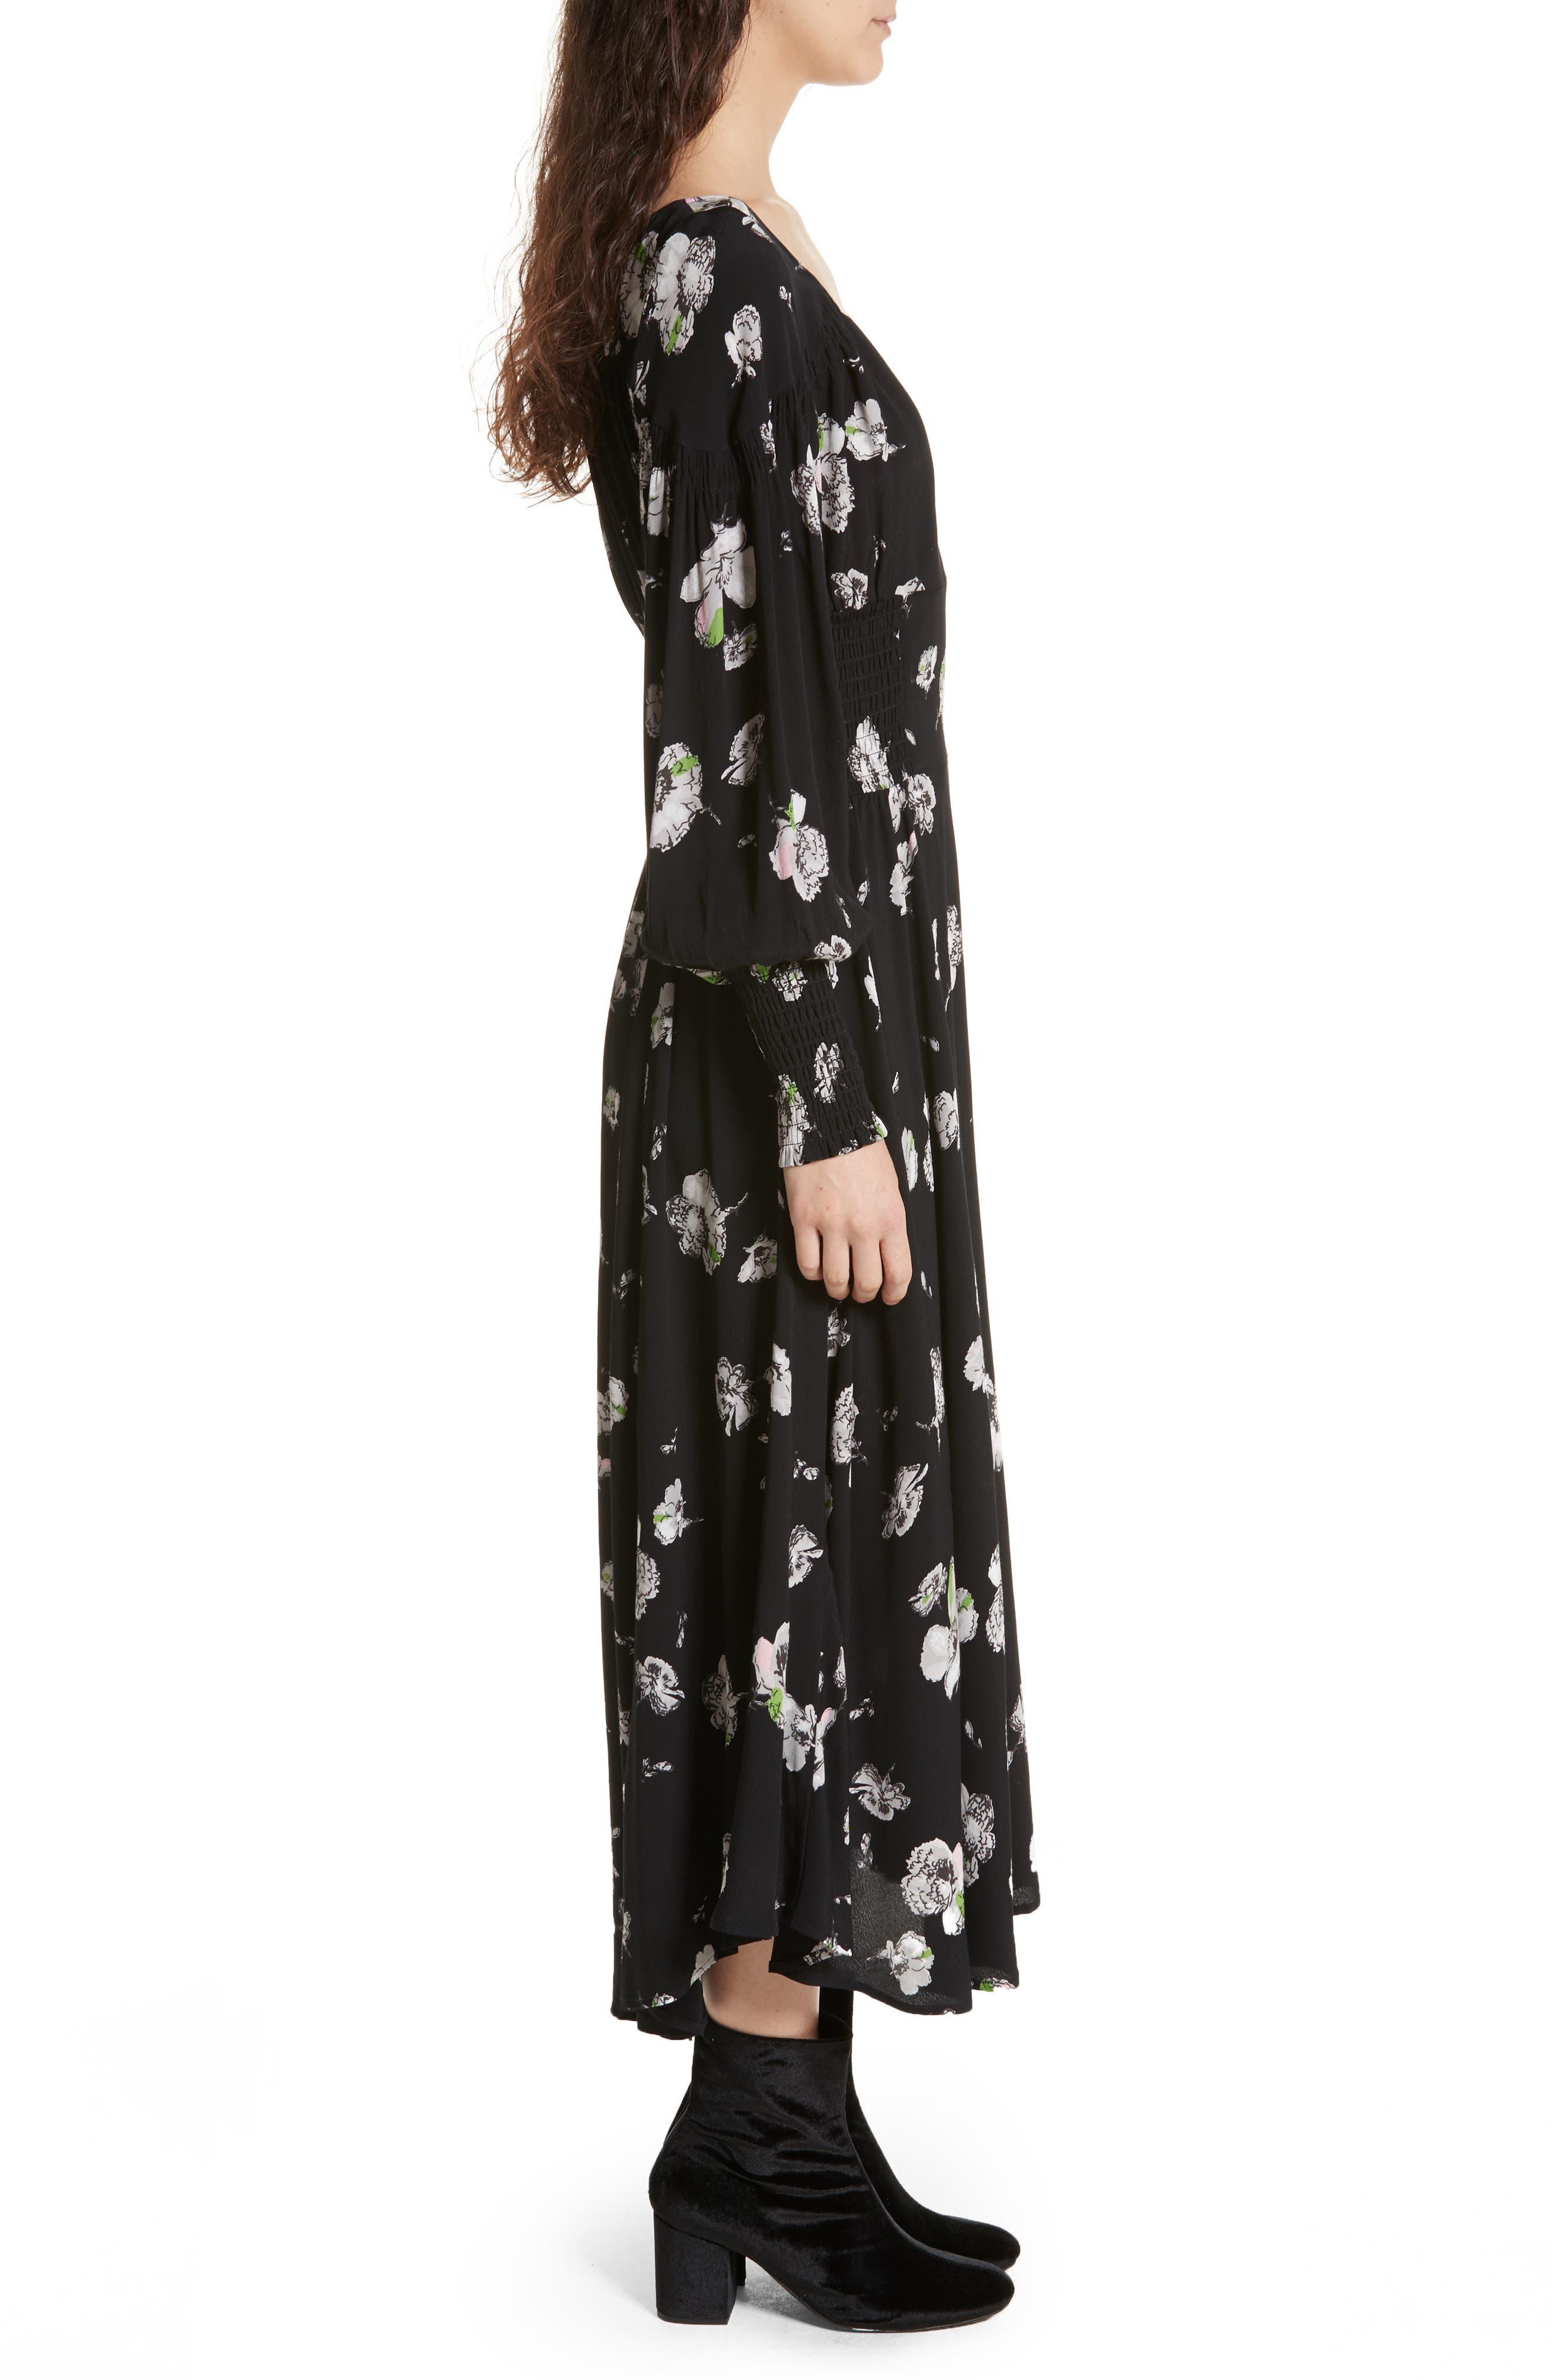 So Sweetly Midi Dress,                             Alternate thumbnail 3, color,                             001